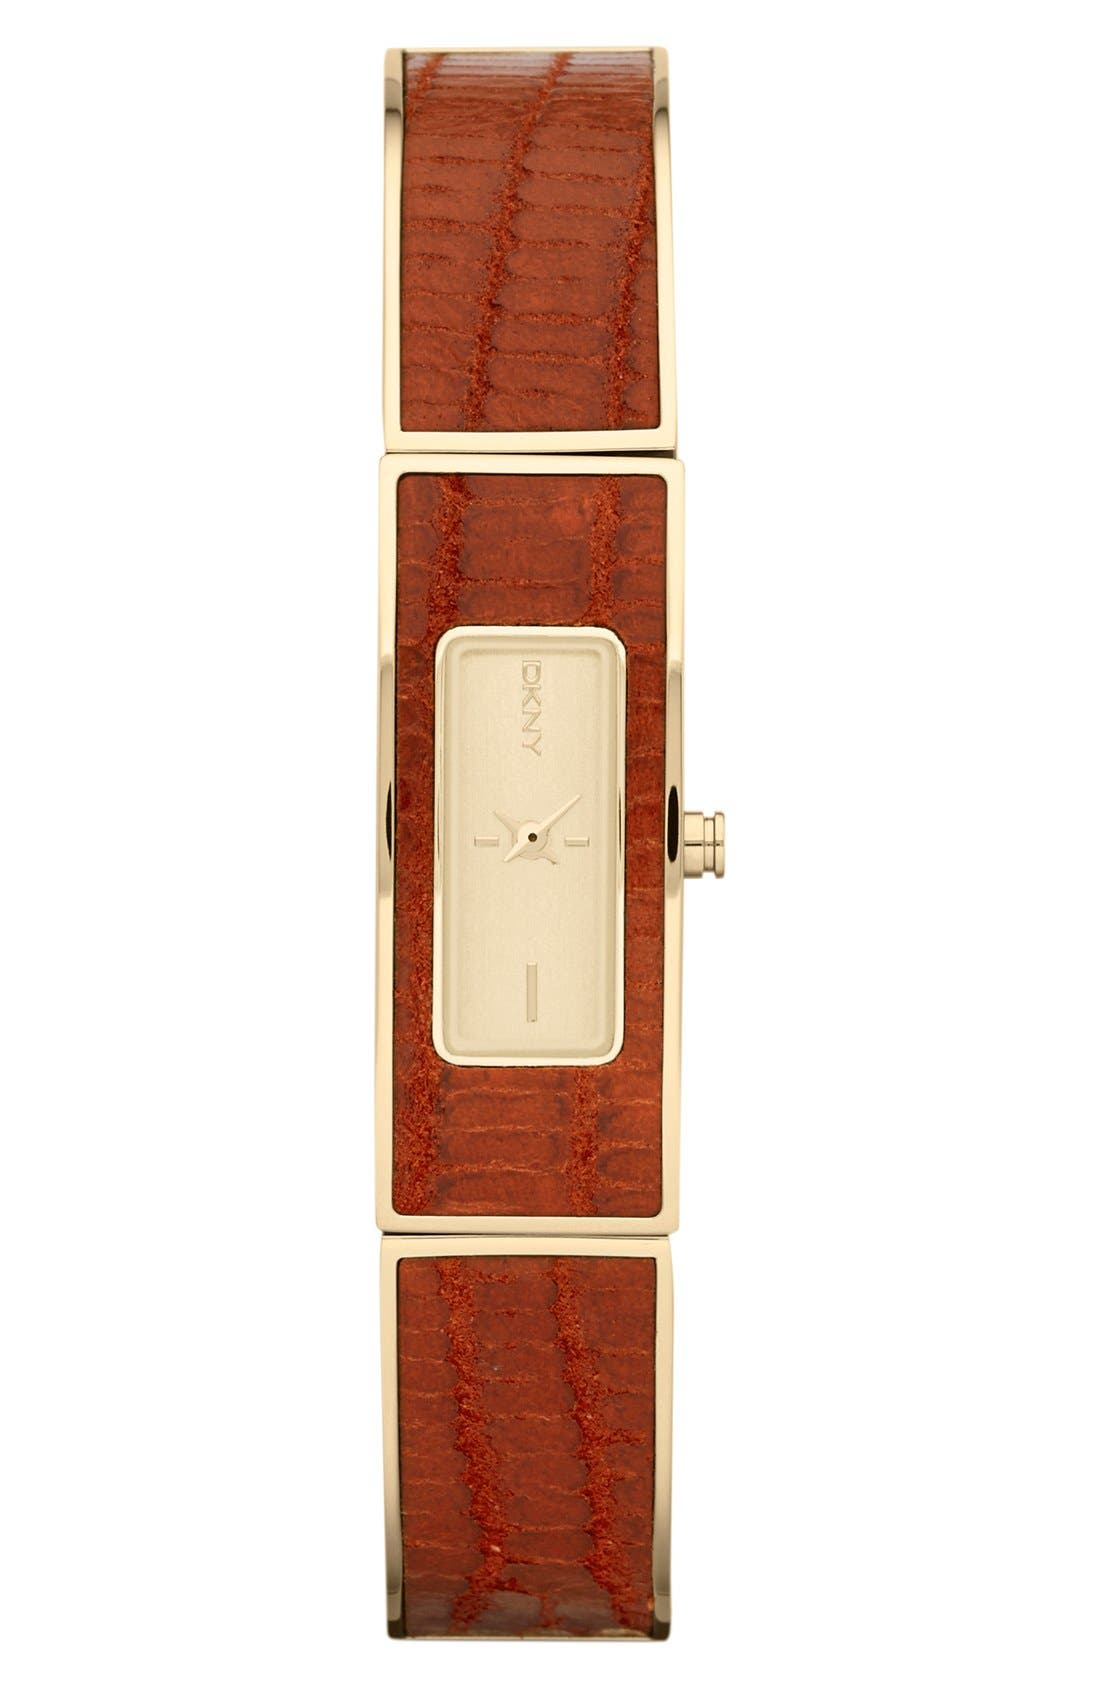 Main Image - DKNY Leather Bangle Watch, 13mm x 33mm